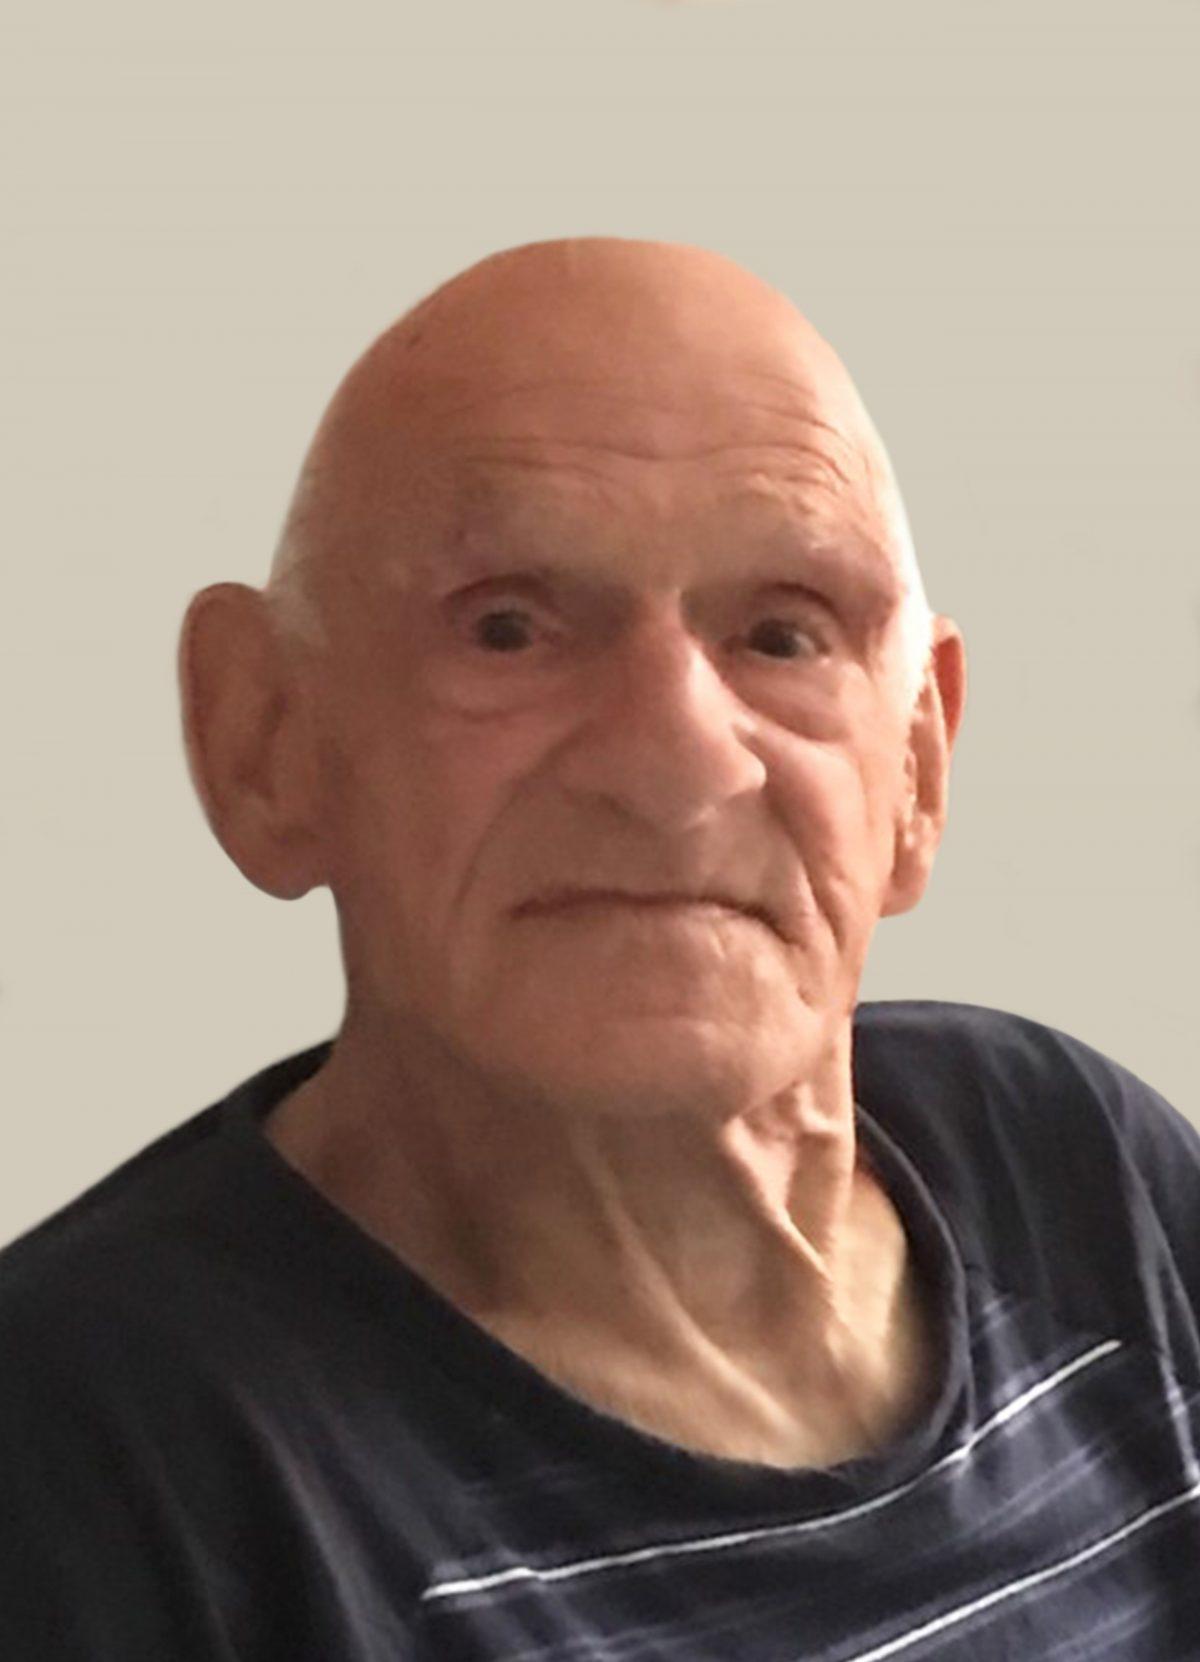 Joseph Vandormael